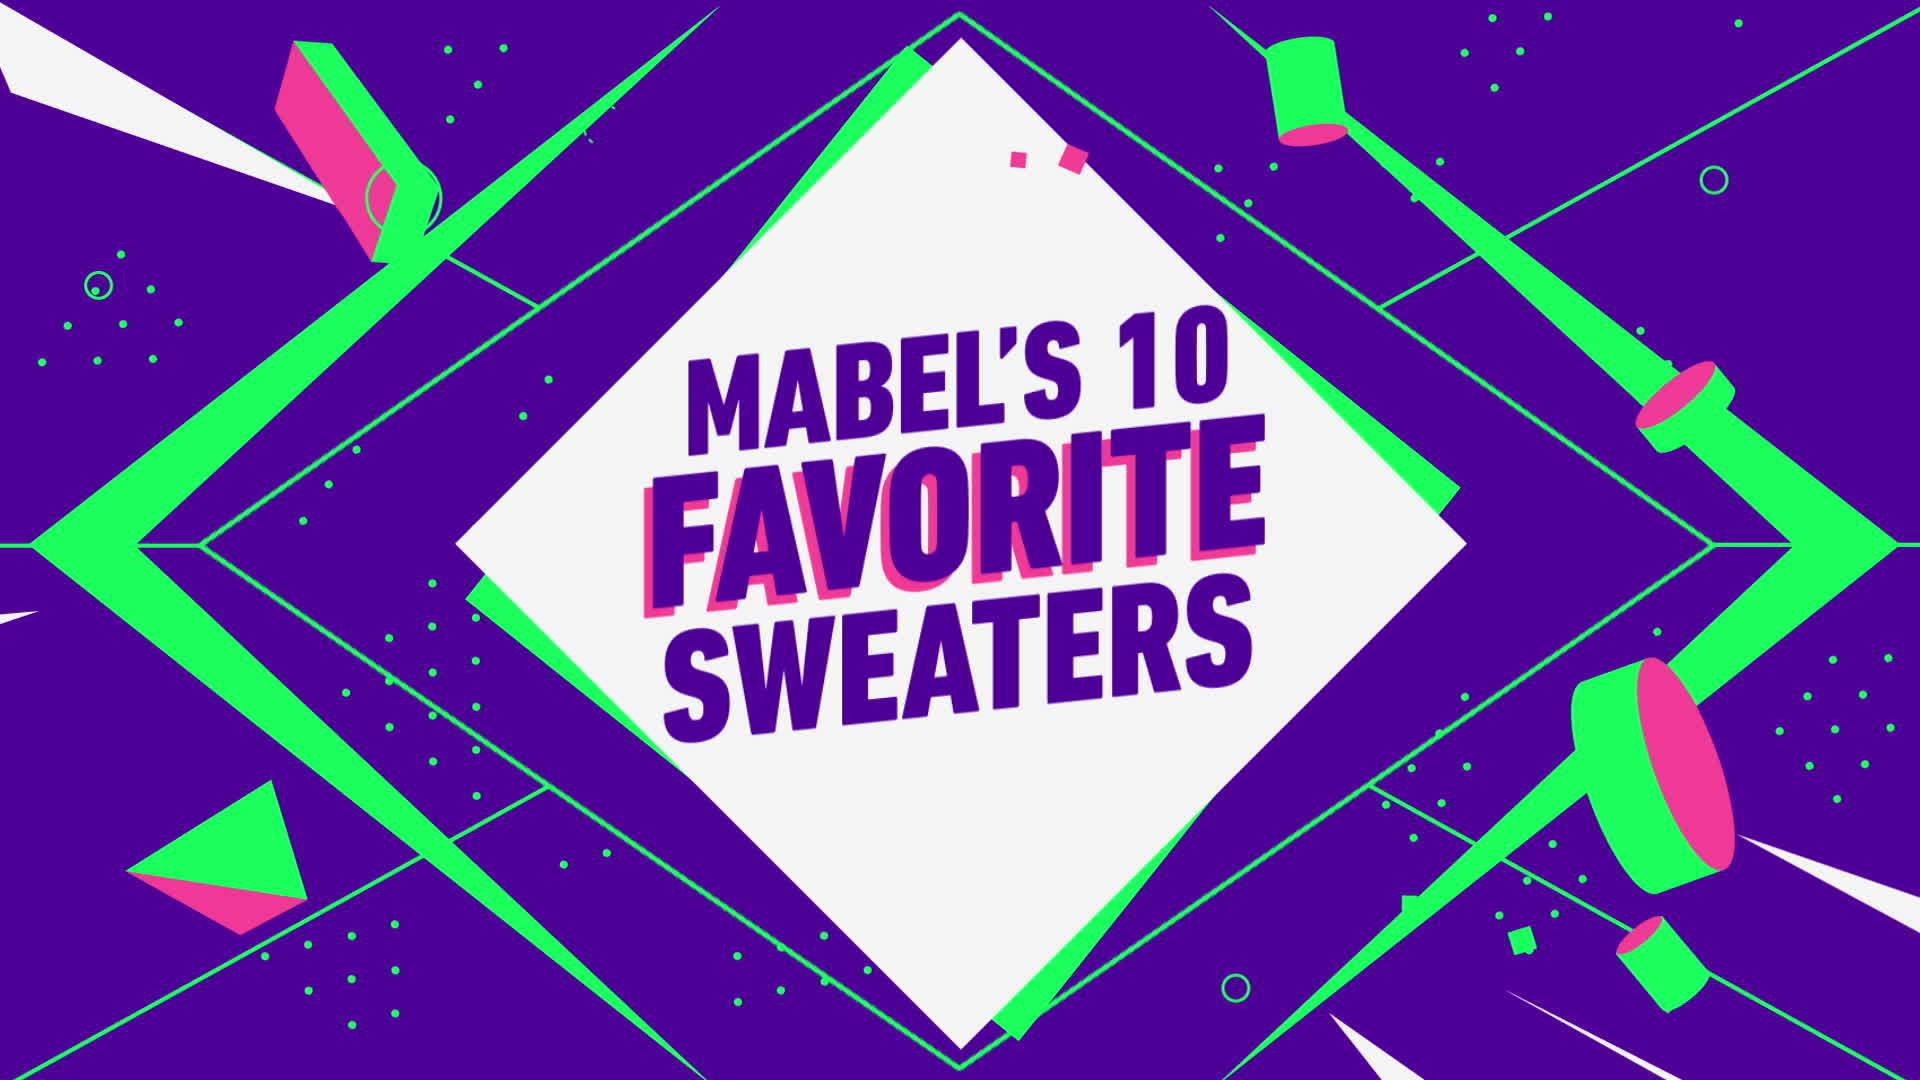 Mabel's 10 Favorite Sweaters